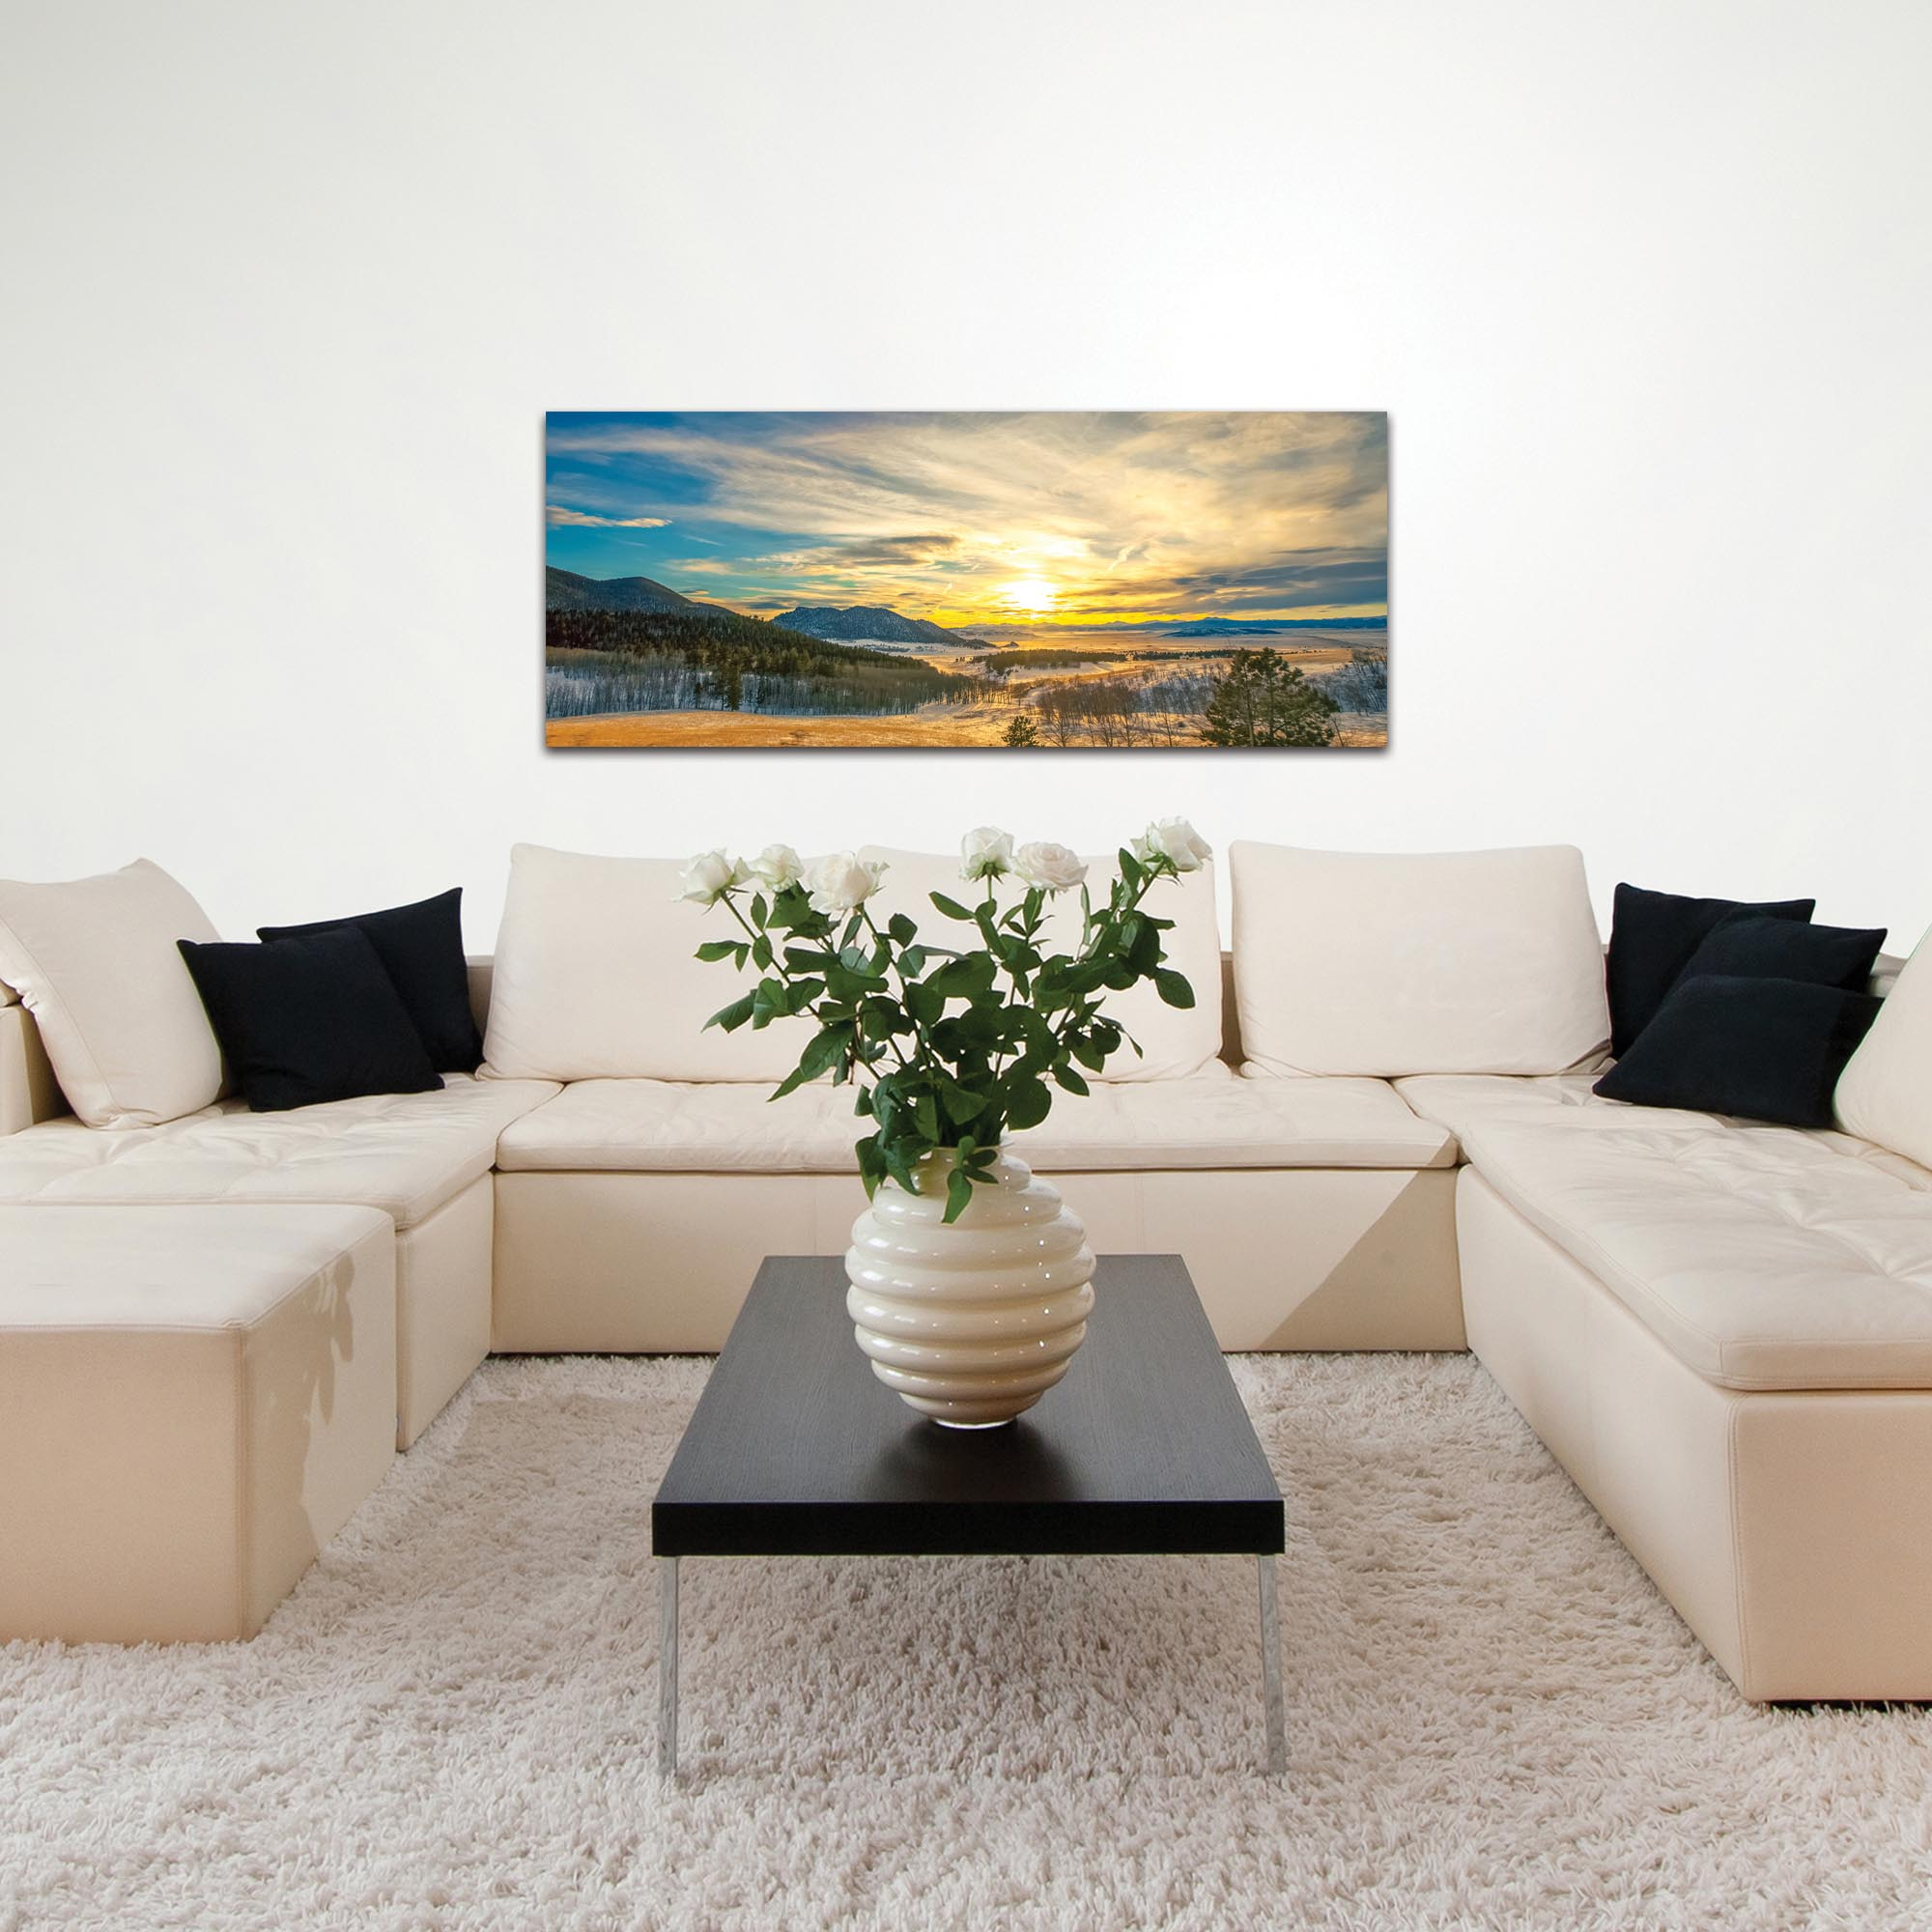 Landscape Photography 'Brisk Sunset' - Winter Sunset Art on Metal or Plexiglass - Lifestyle View